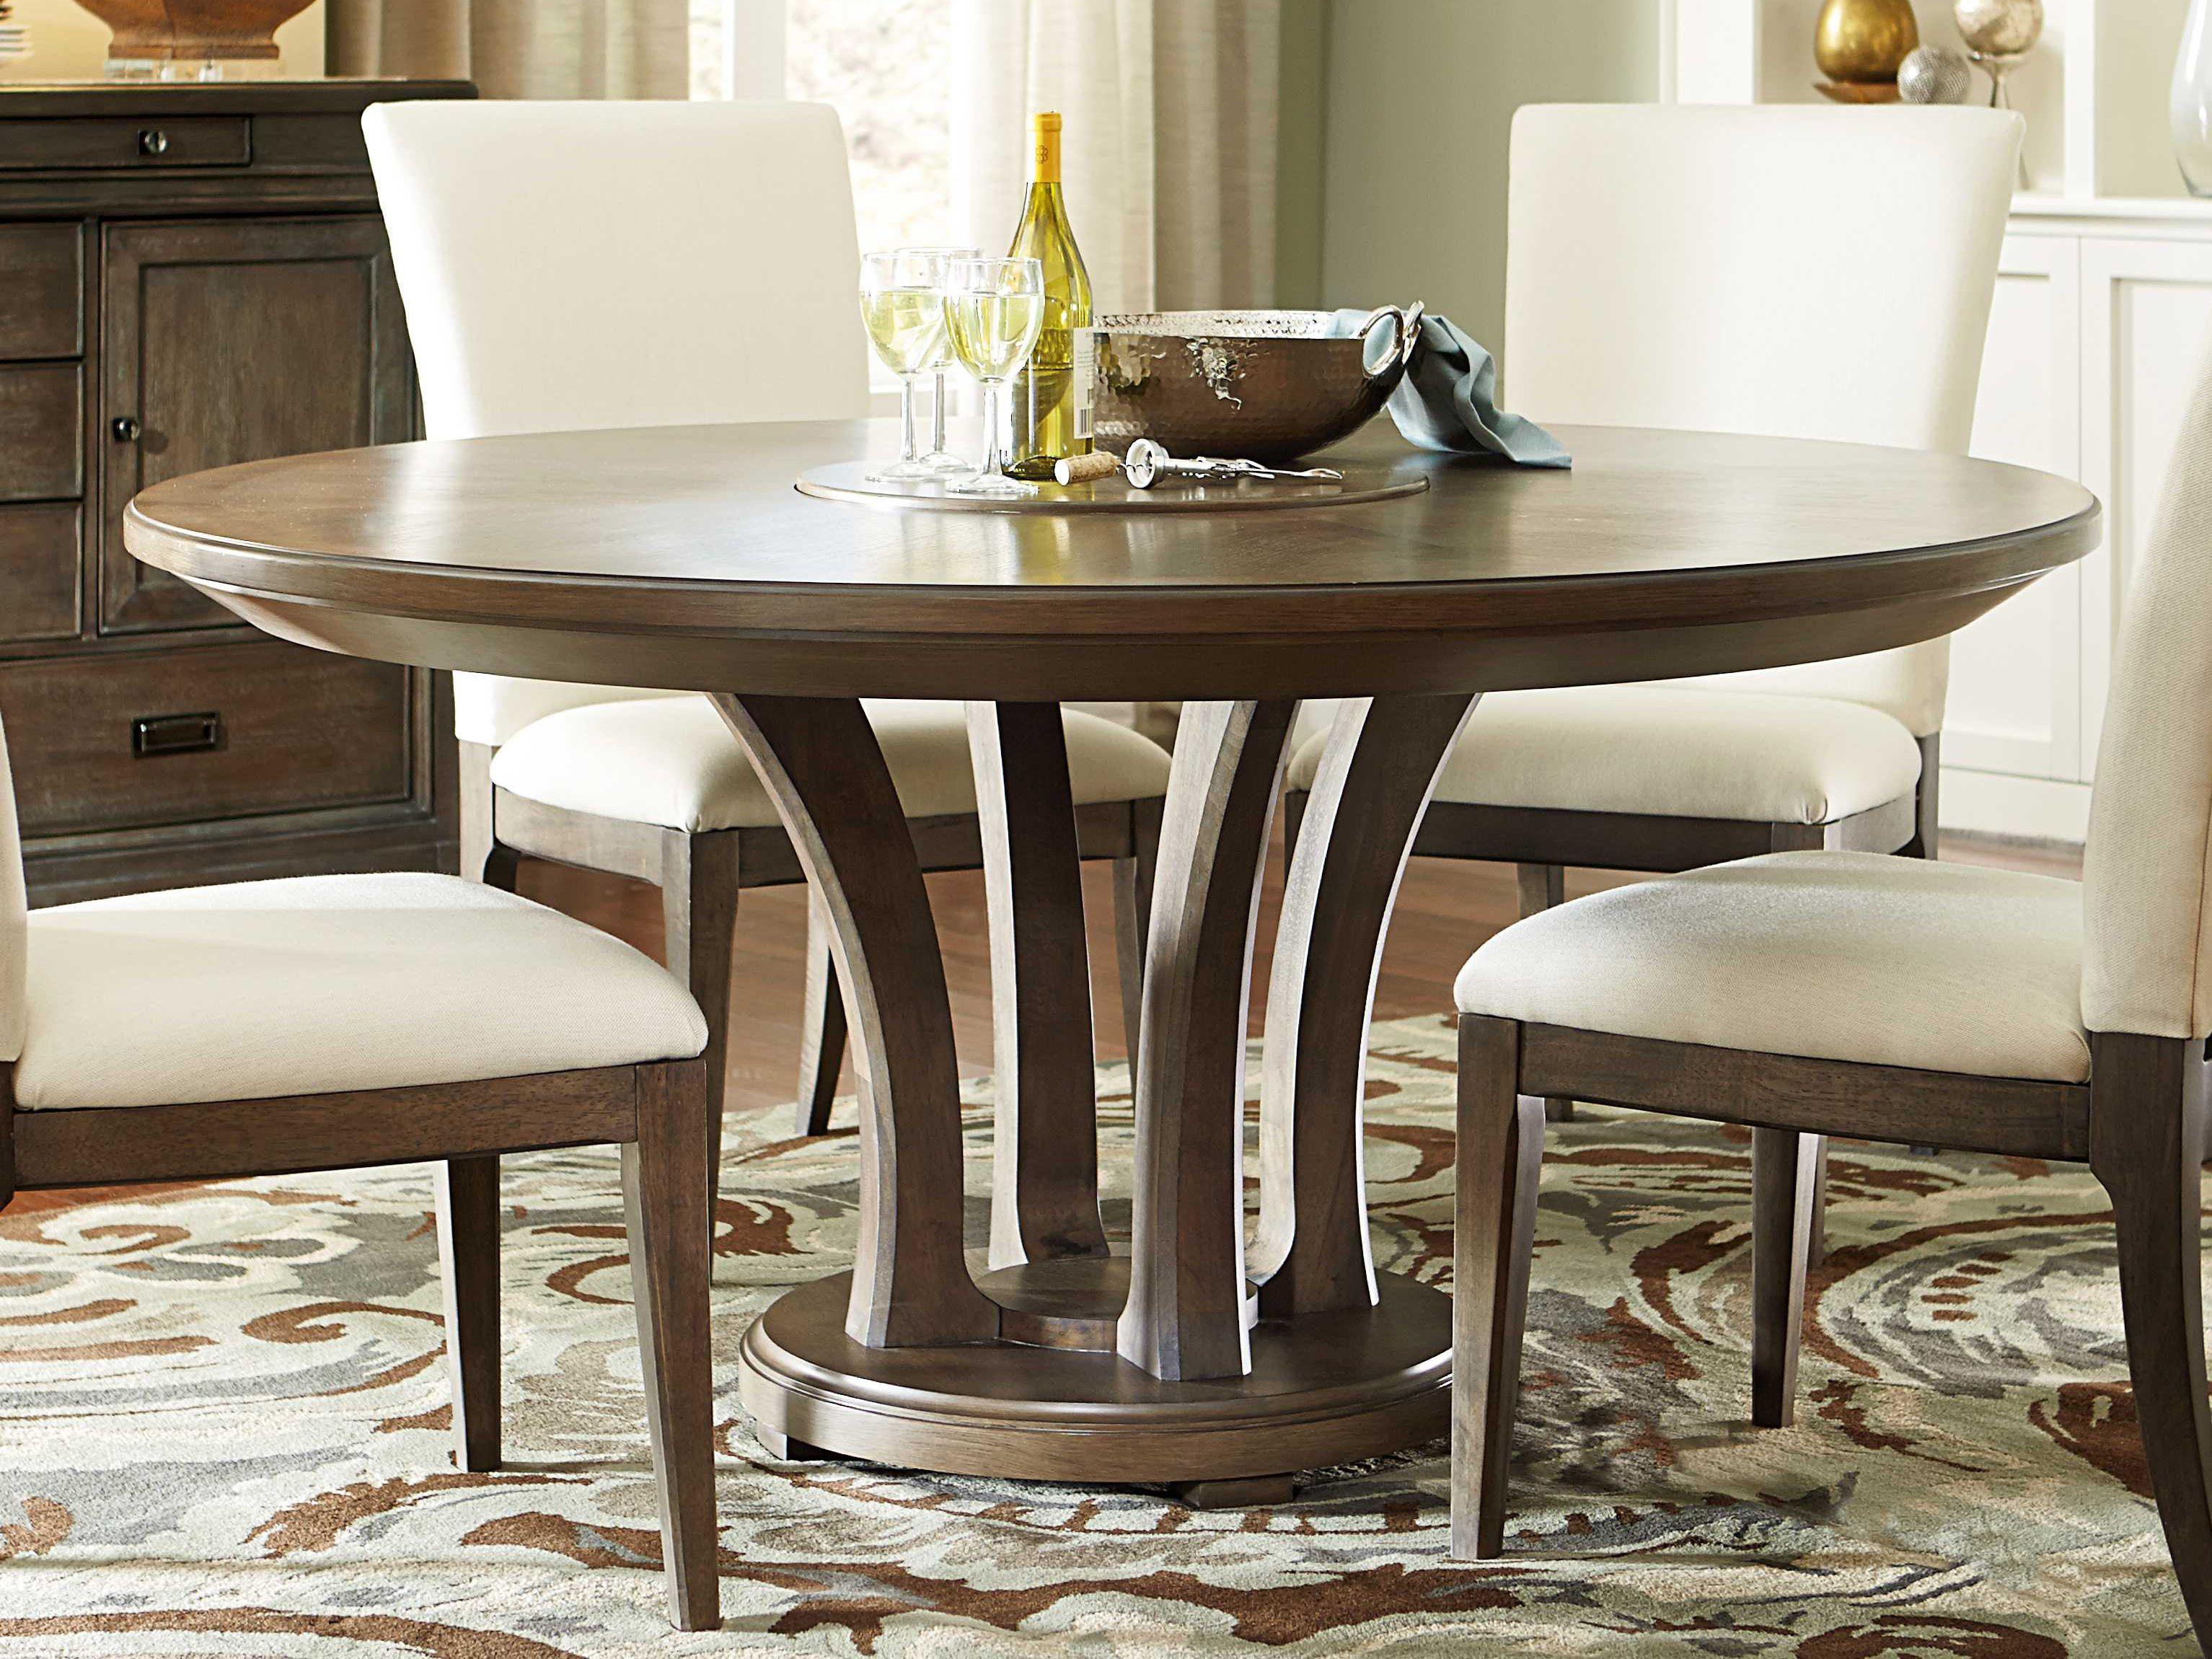 gray wash coffee table set